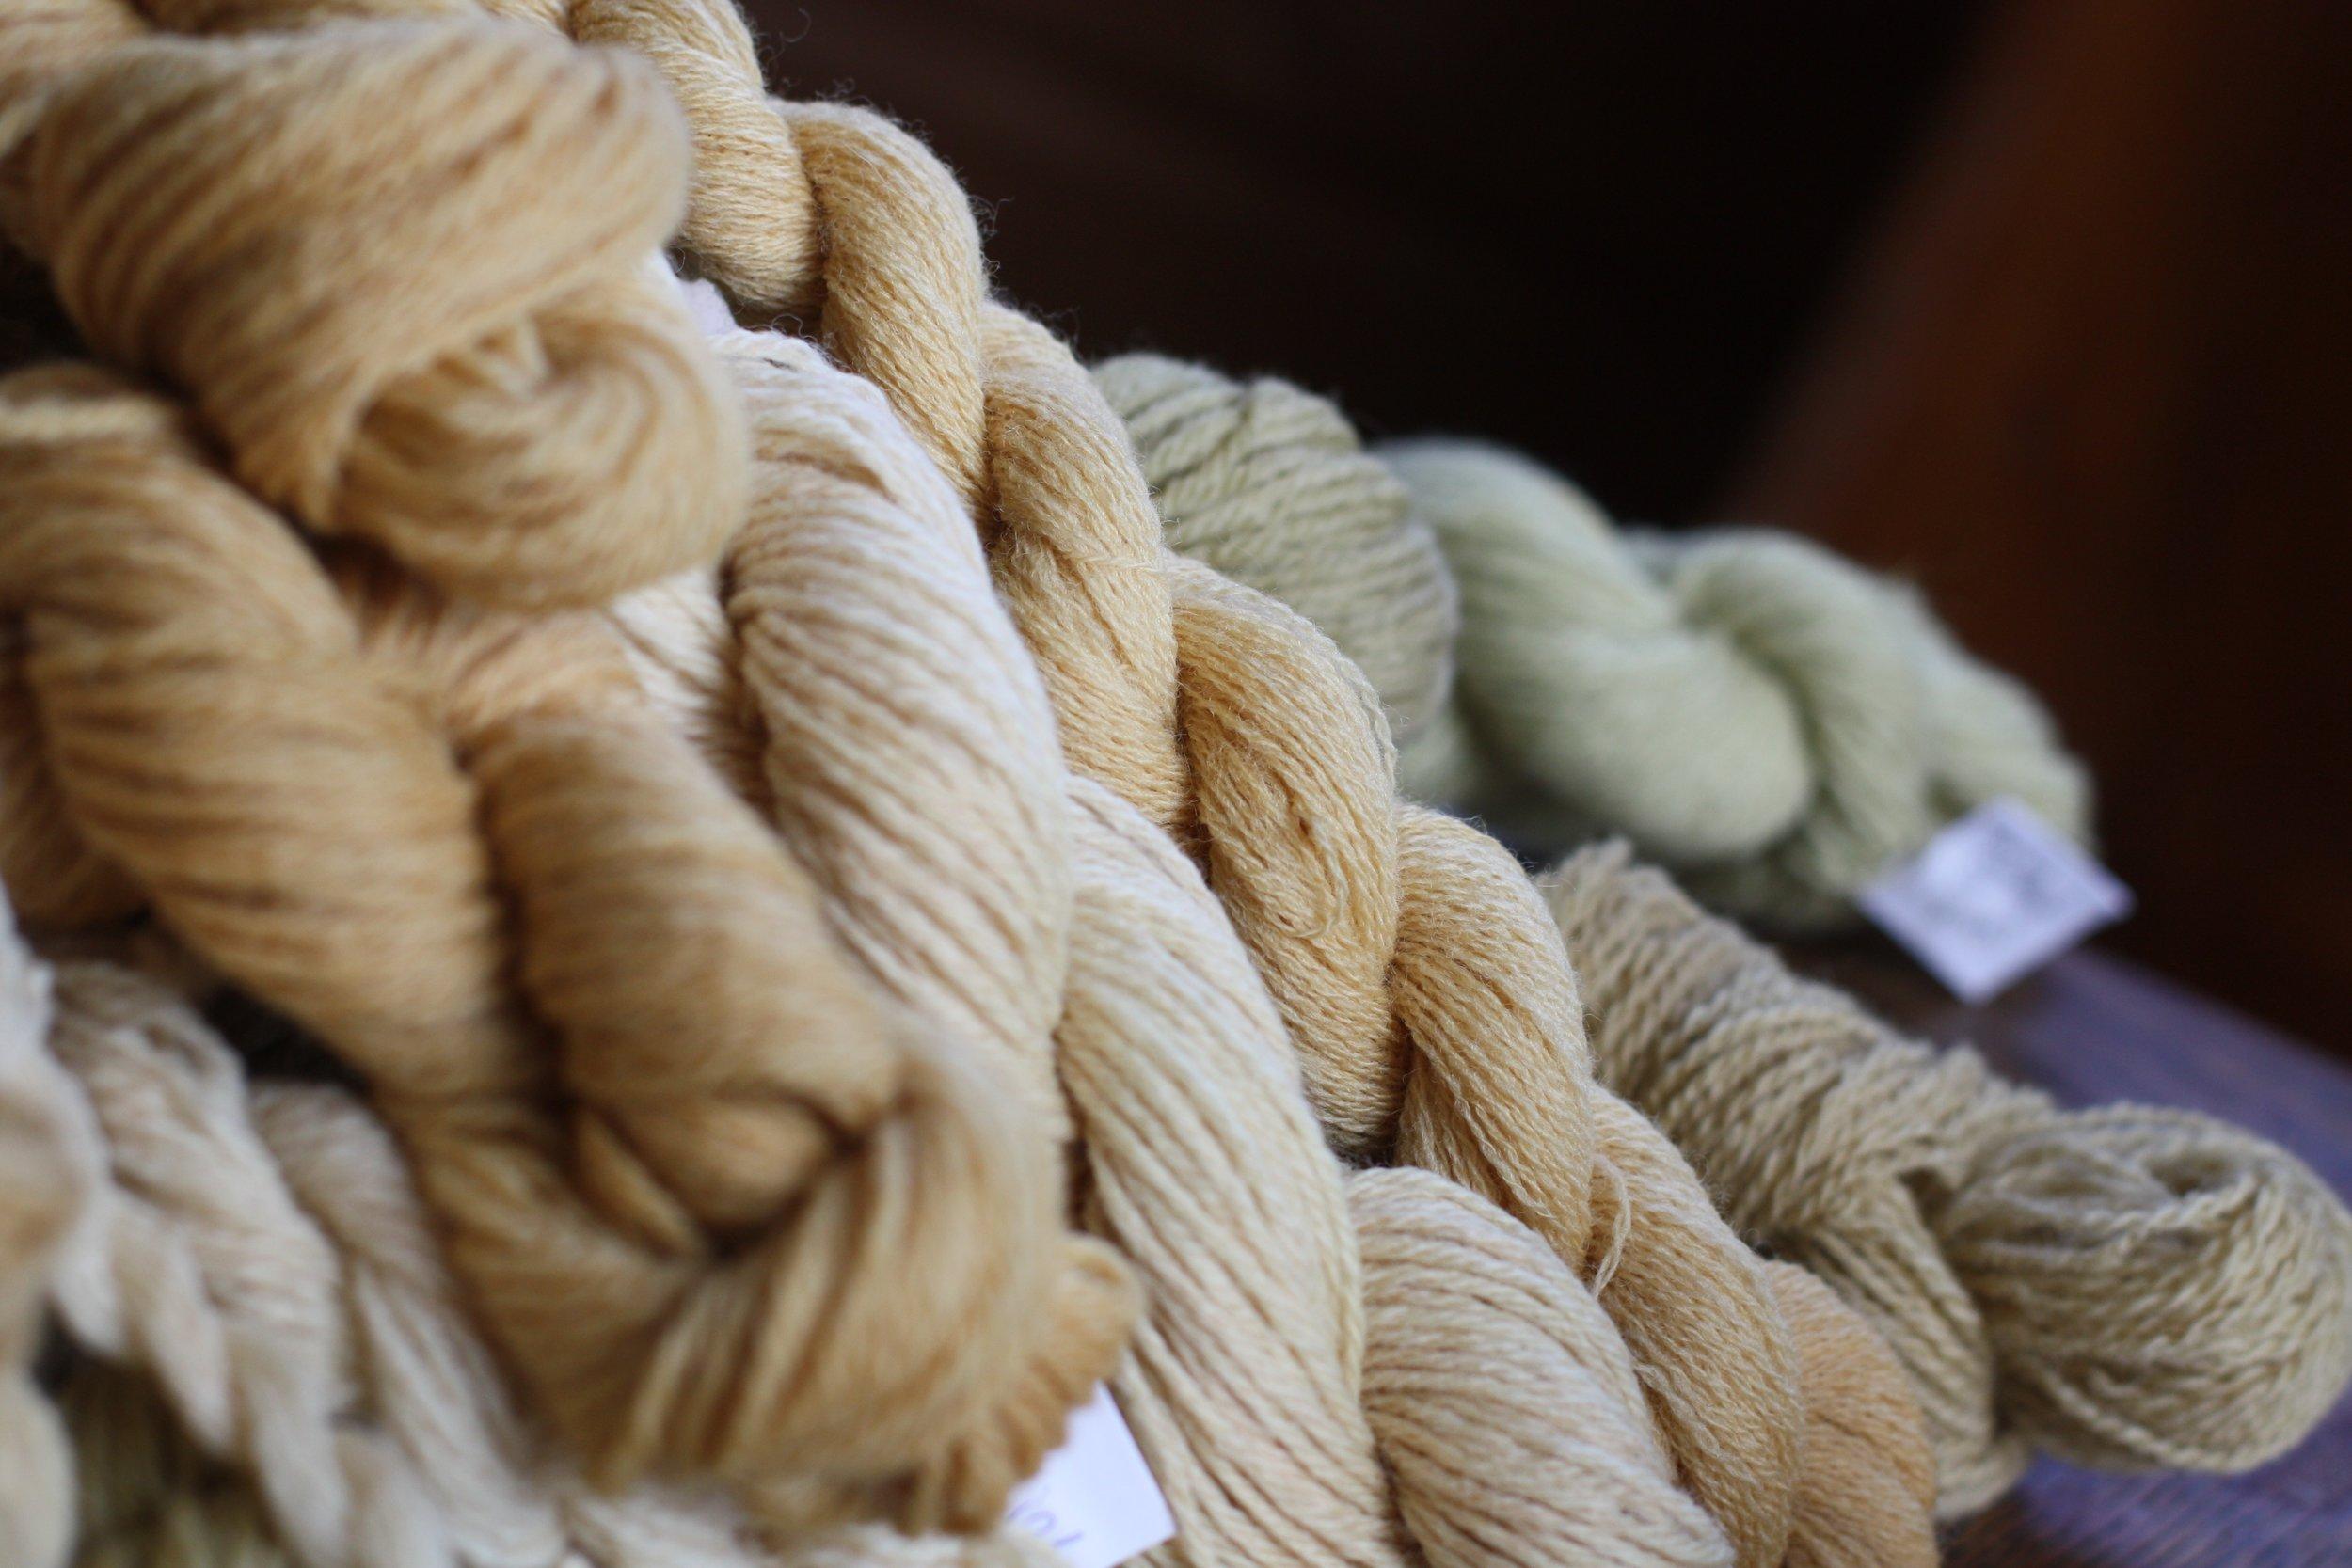 Wool dyed with chokecherry, rosehip, alder, yarrow and walnut | 14 Mile Farm Handweaving and Homesteading in Alaska